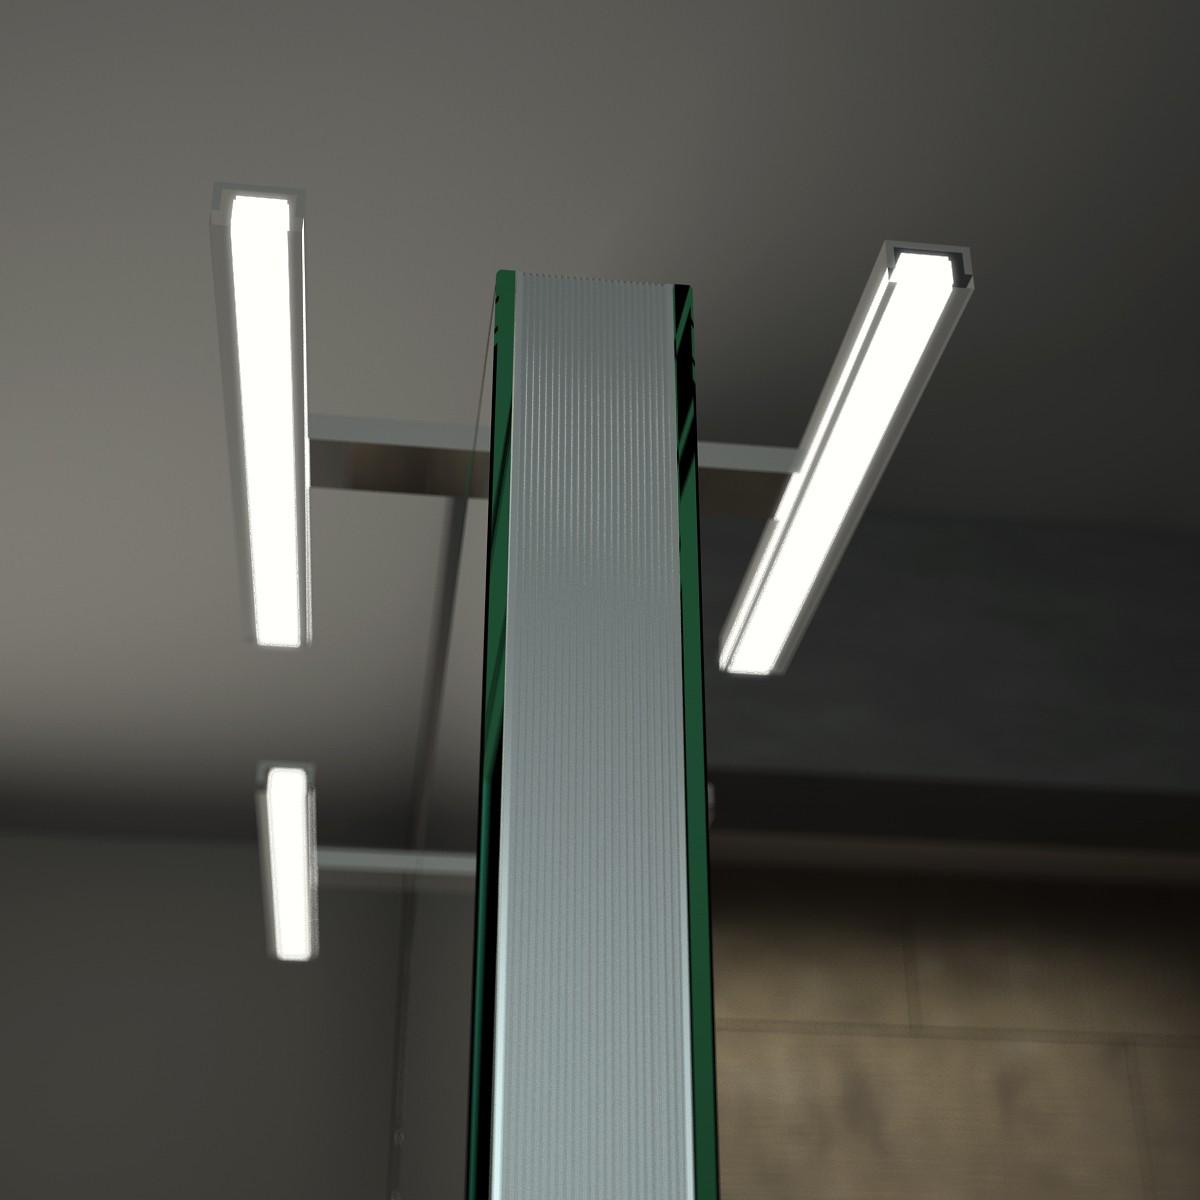 spiegel raumteiler mit leuchte esther 989704171. Black Bedroom Furniture Sets. Home Design Ideas